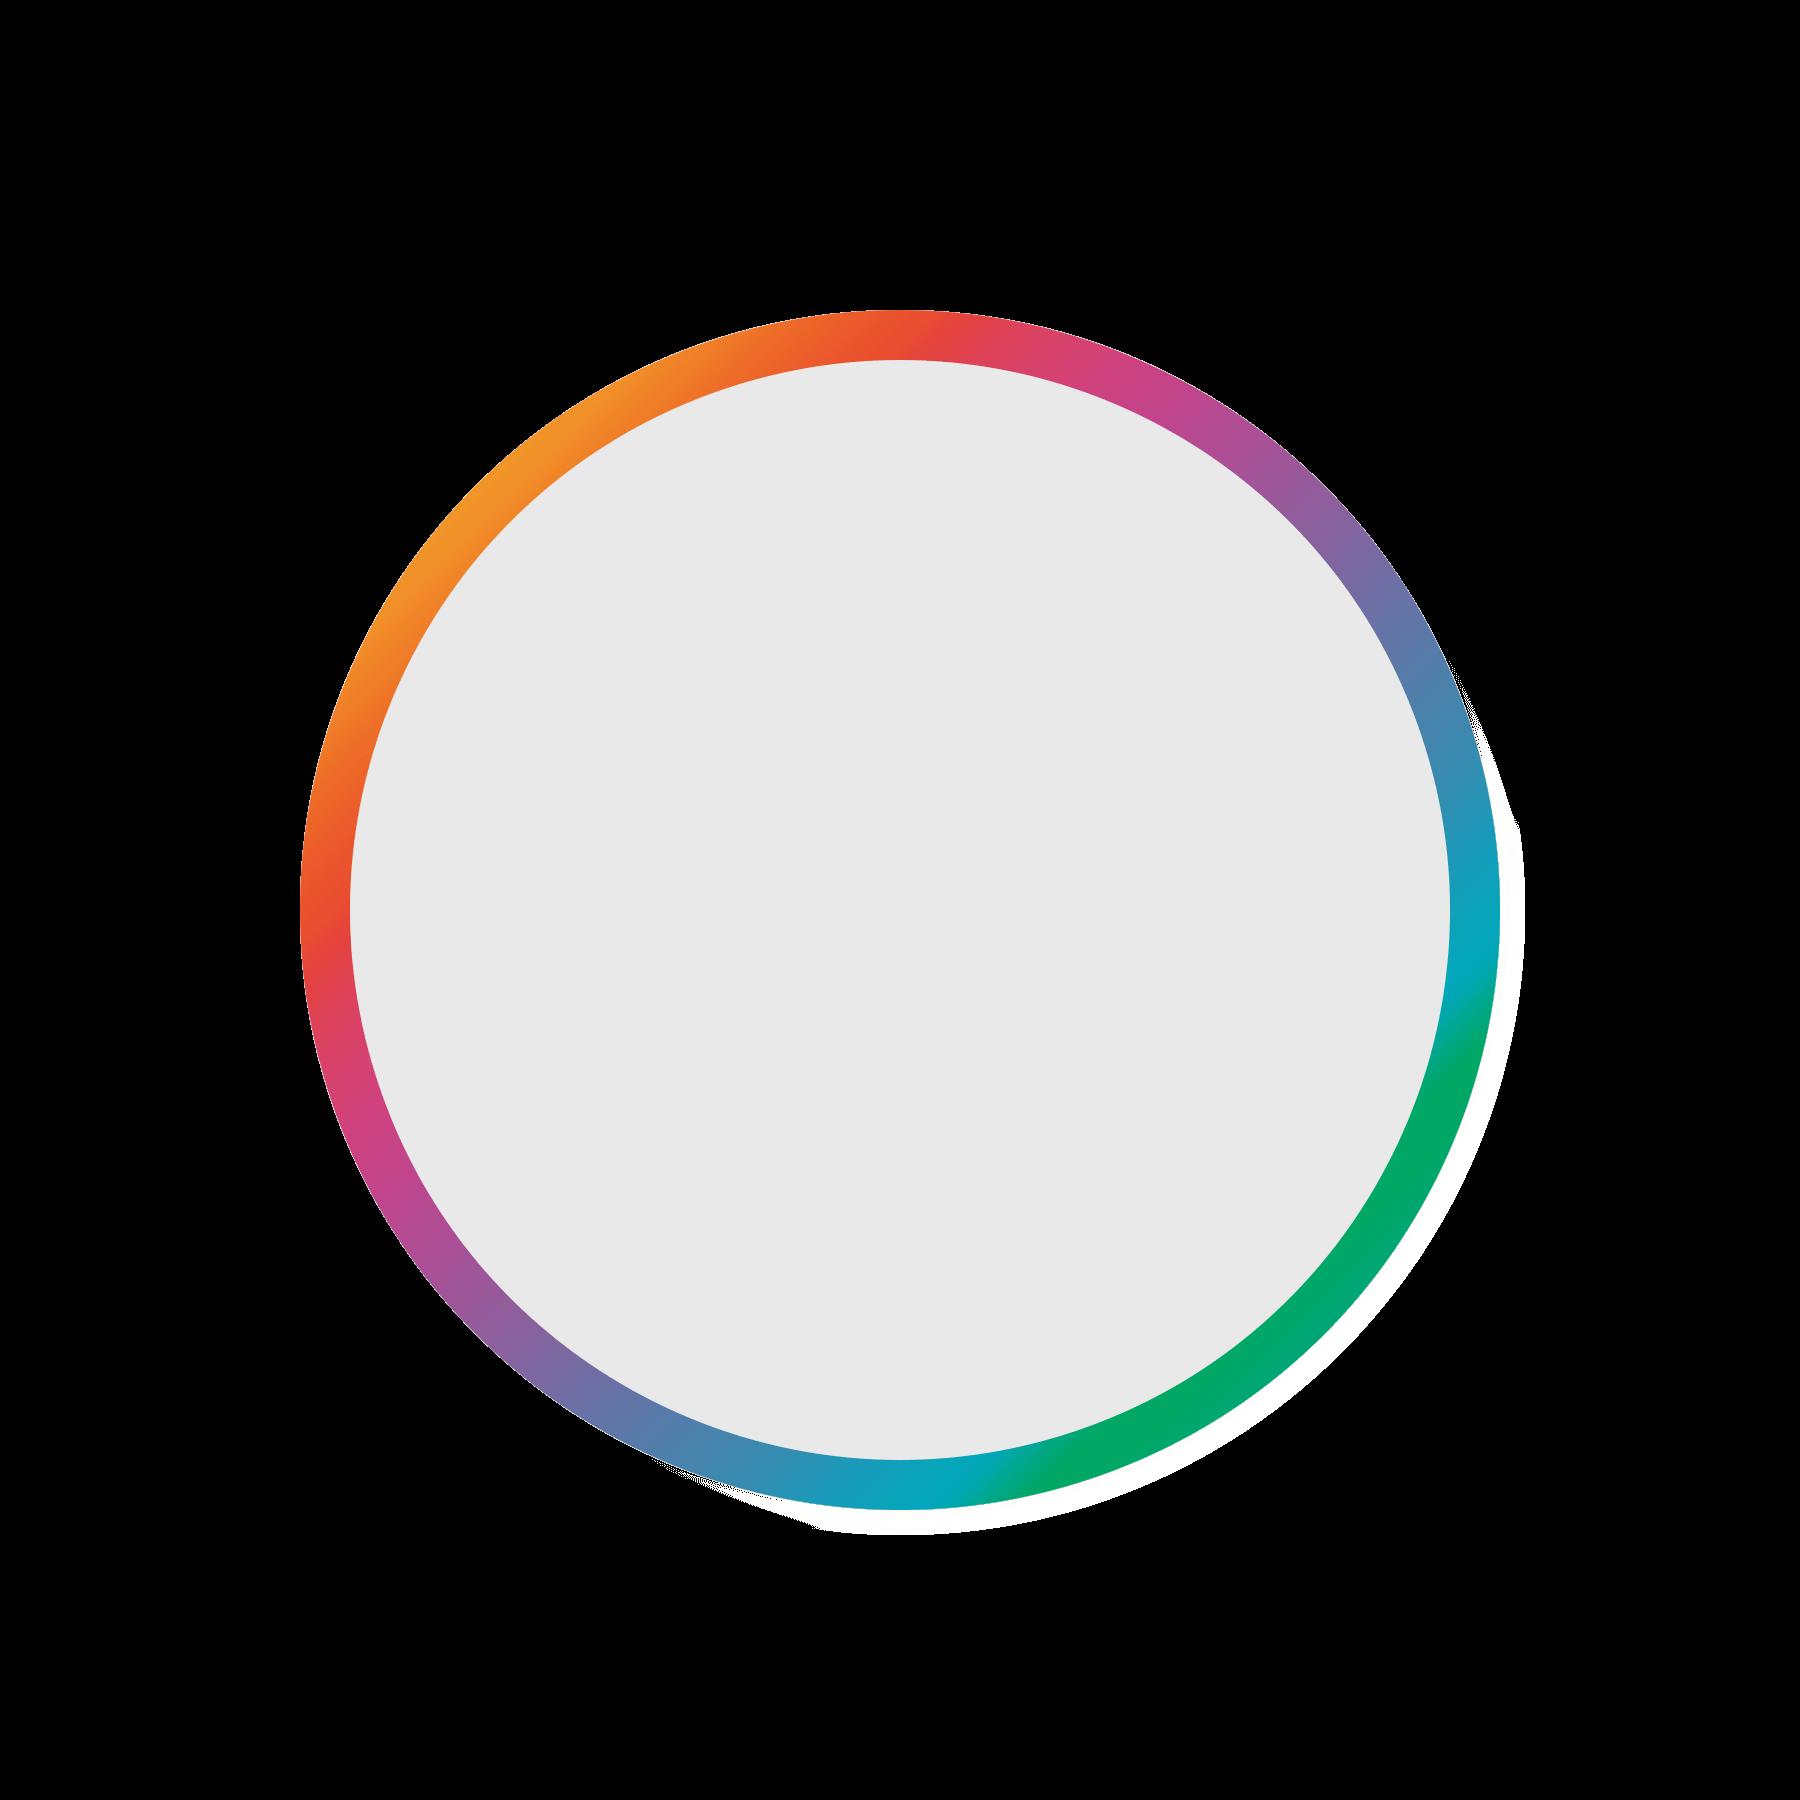 XMG TRINITY mATX - Intel Core | Desktop-PC | front left